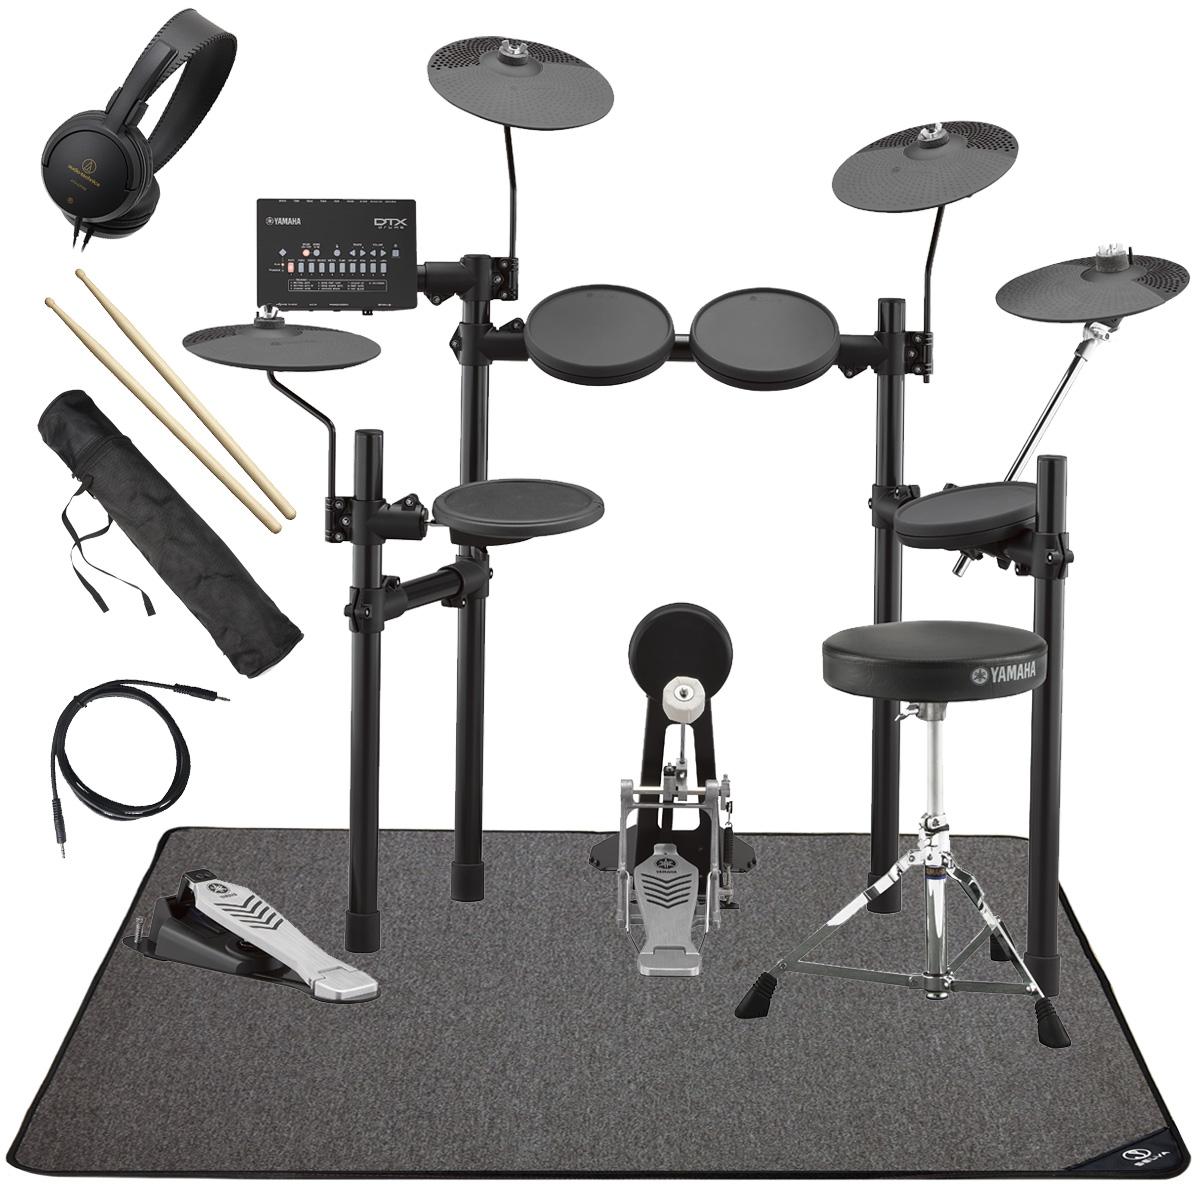 YAMAHA / DTX452KUPGS 3シンバル 電子ドラム マット付き オリジナルスターターパックver2【YRK】